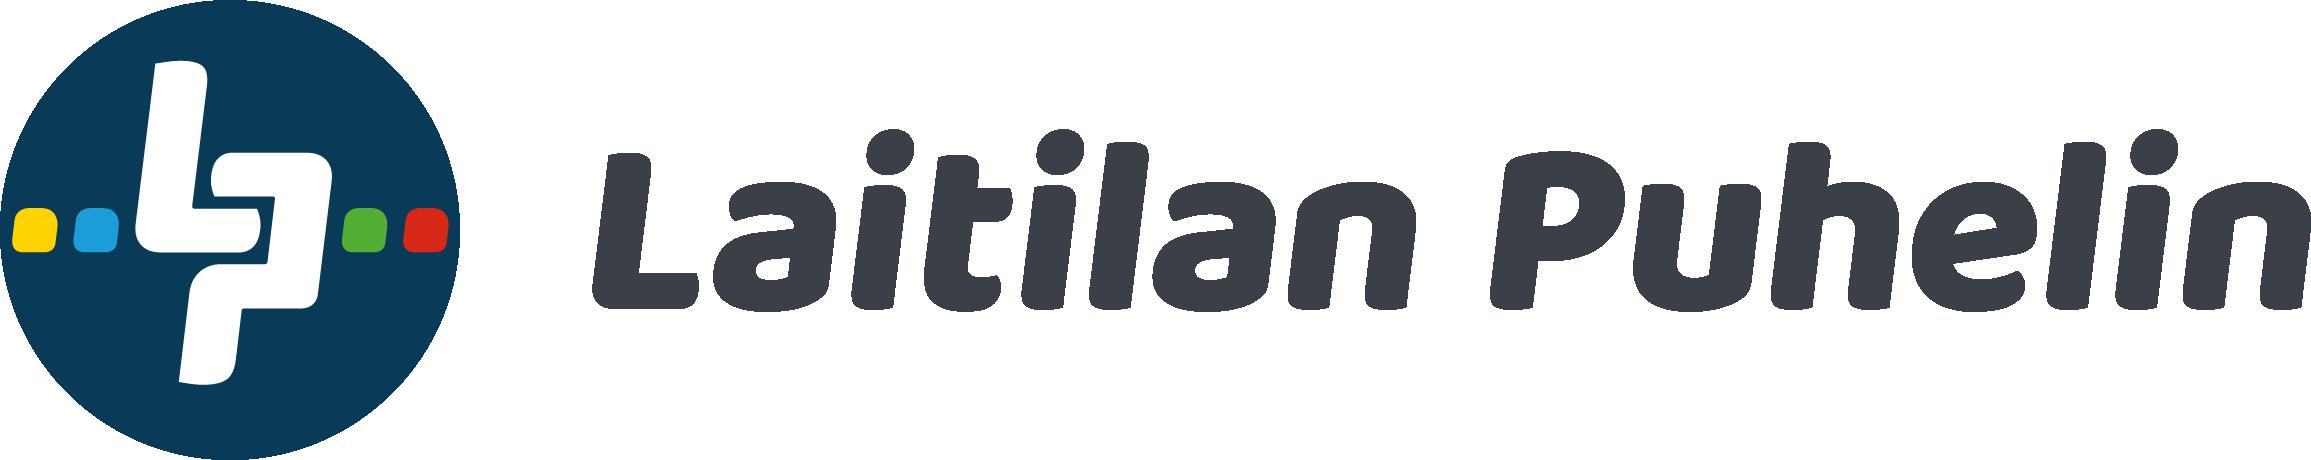 laitilan puhelin logo